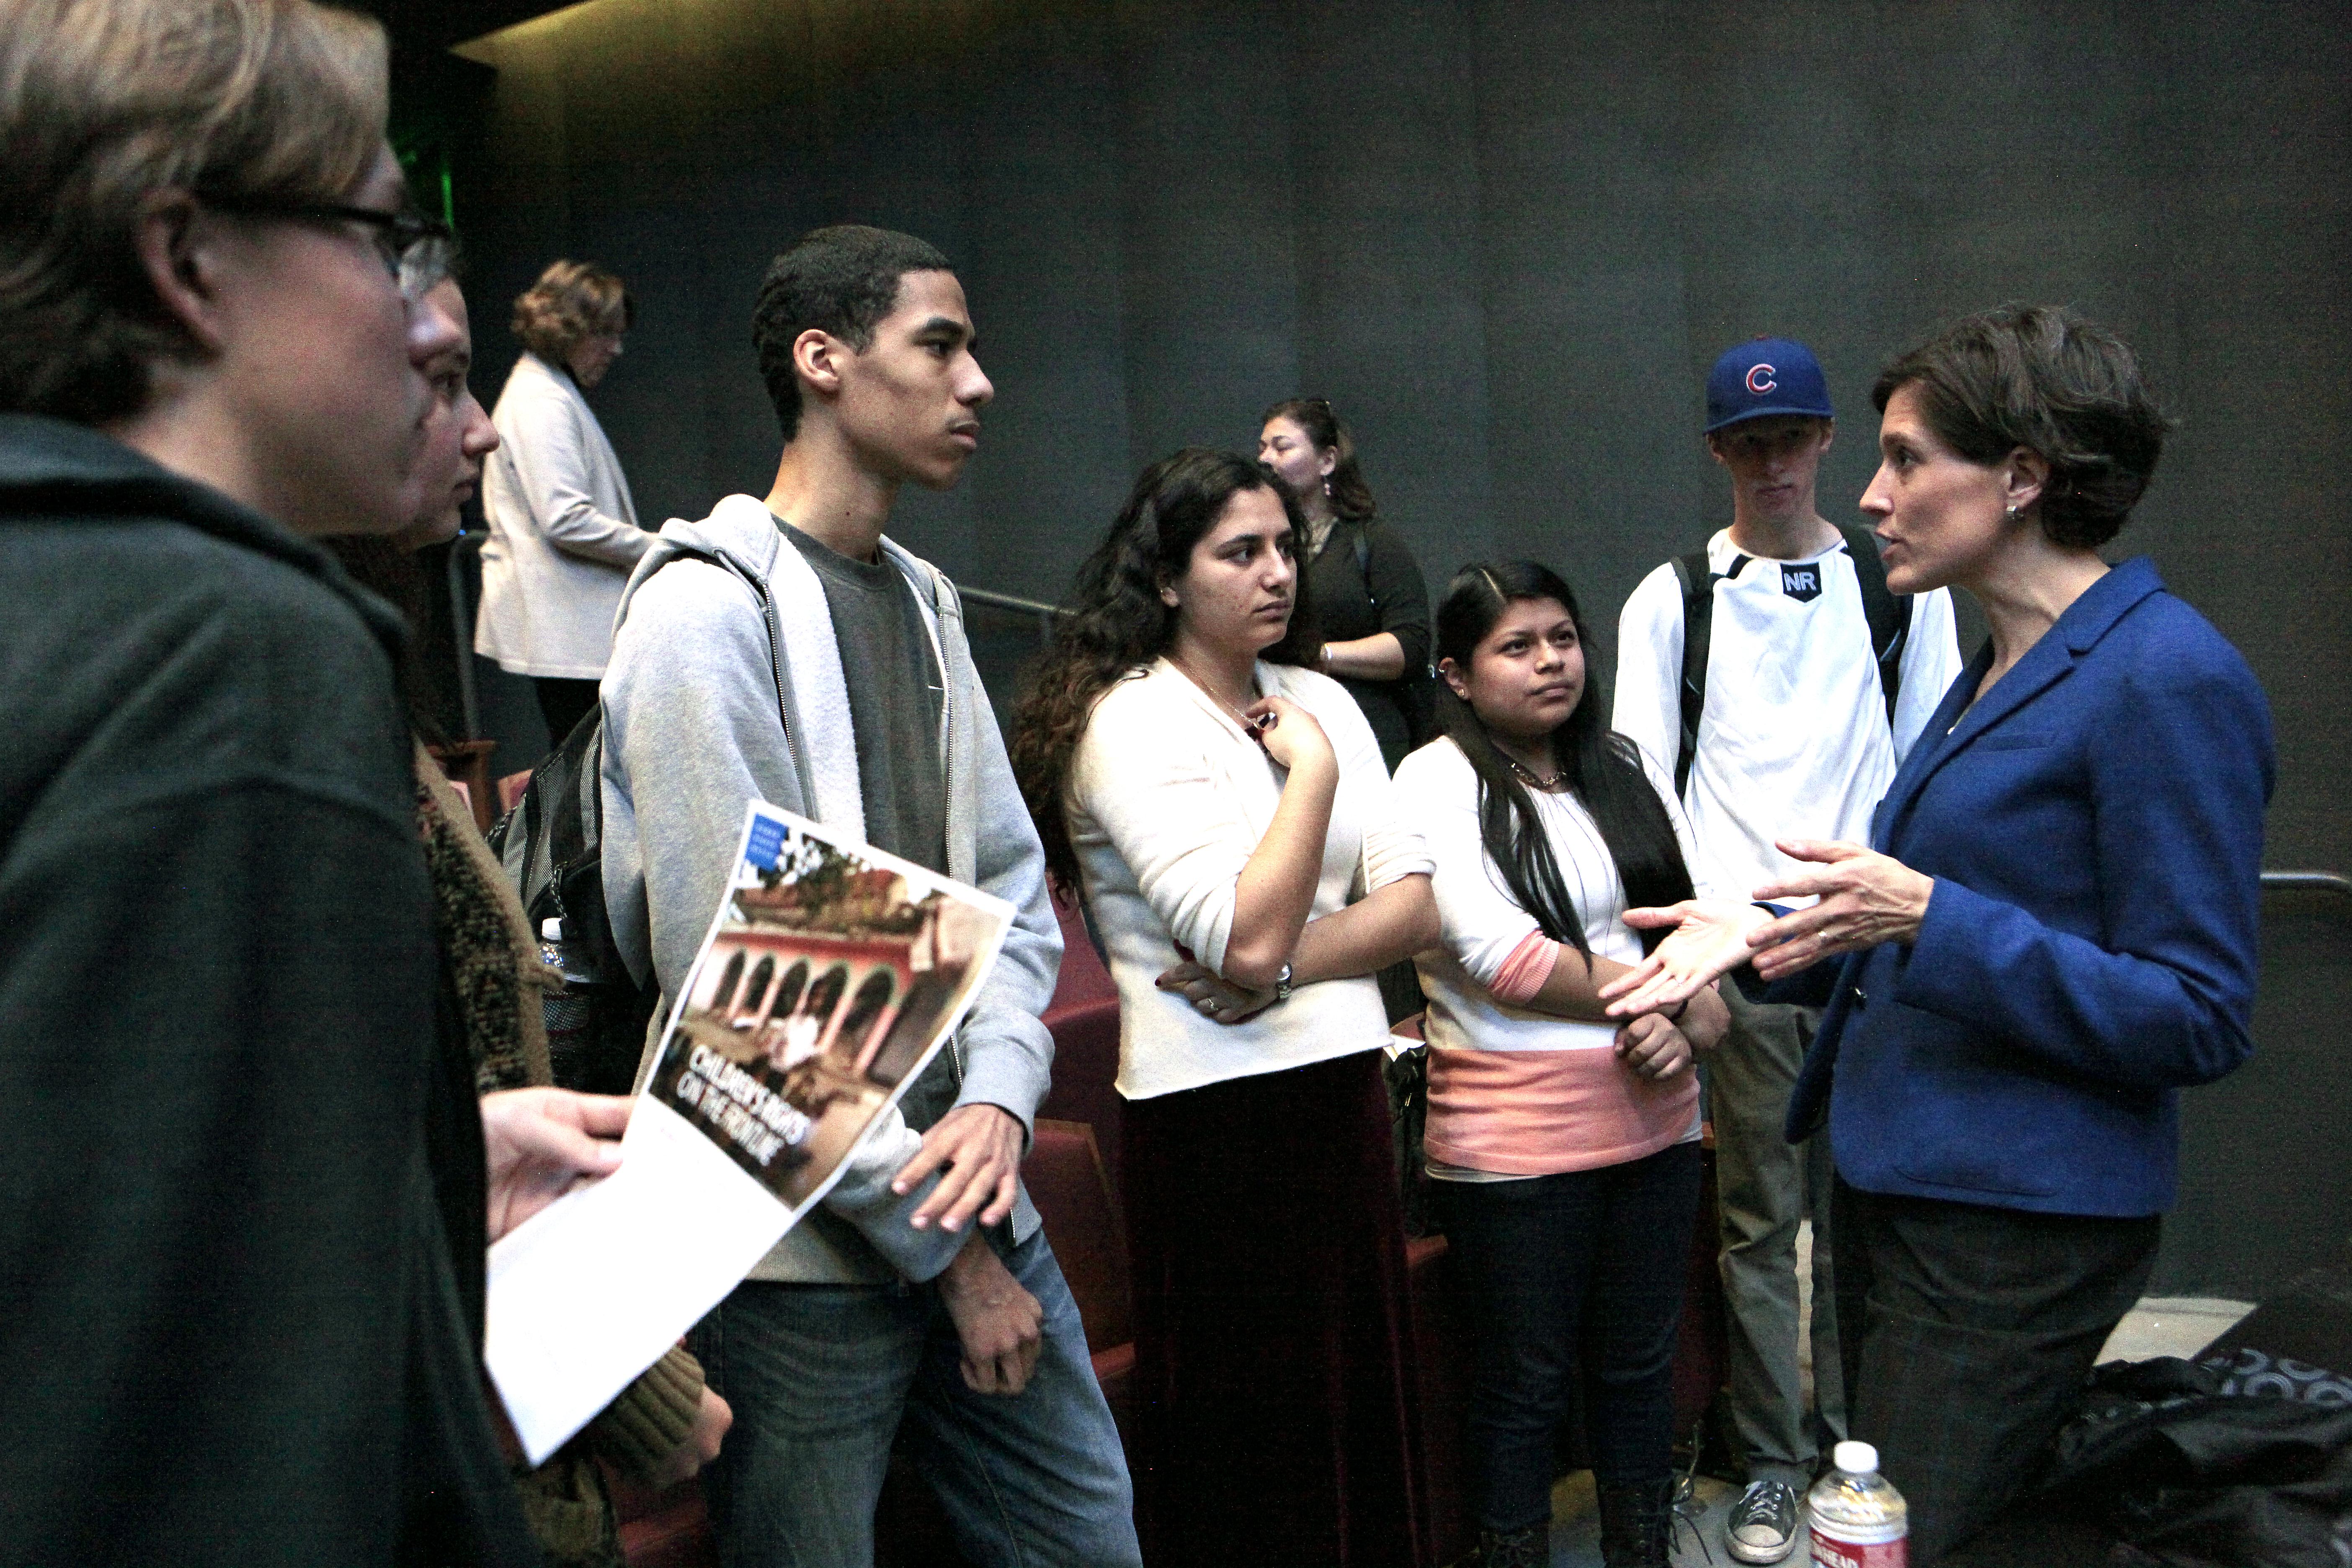 STF meeting with Assemblyman Richard Bloom @ Santa Monica High School.